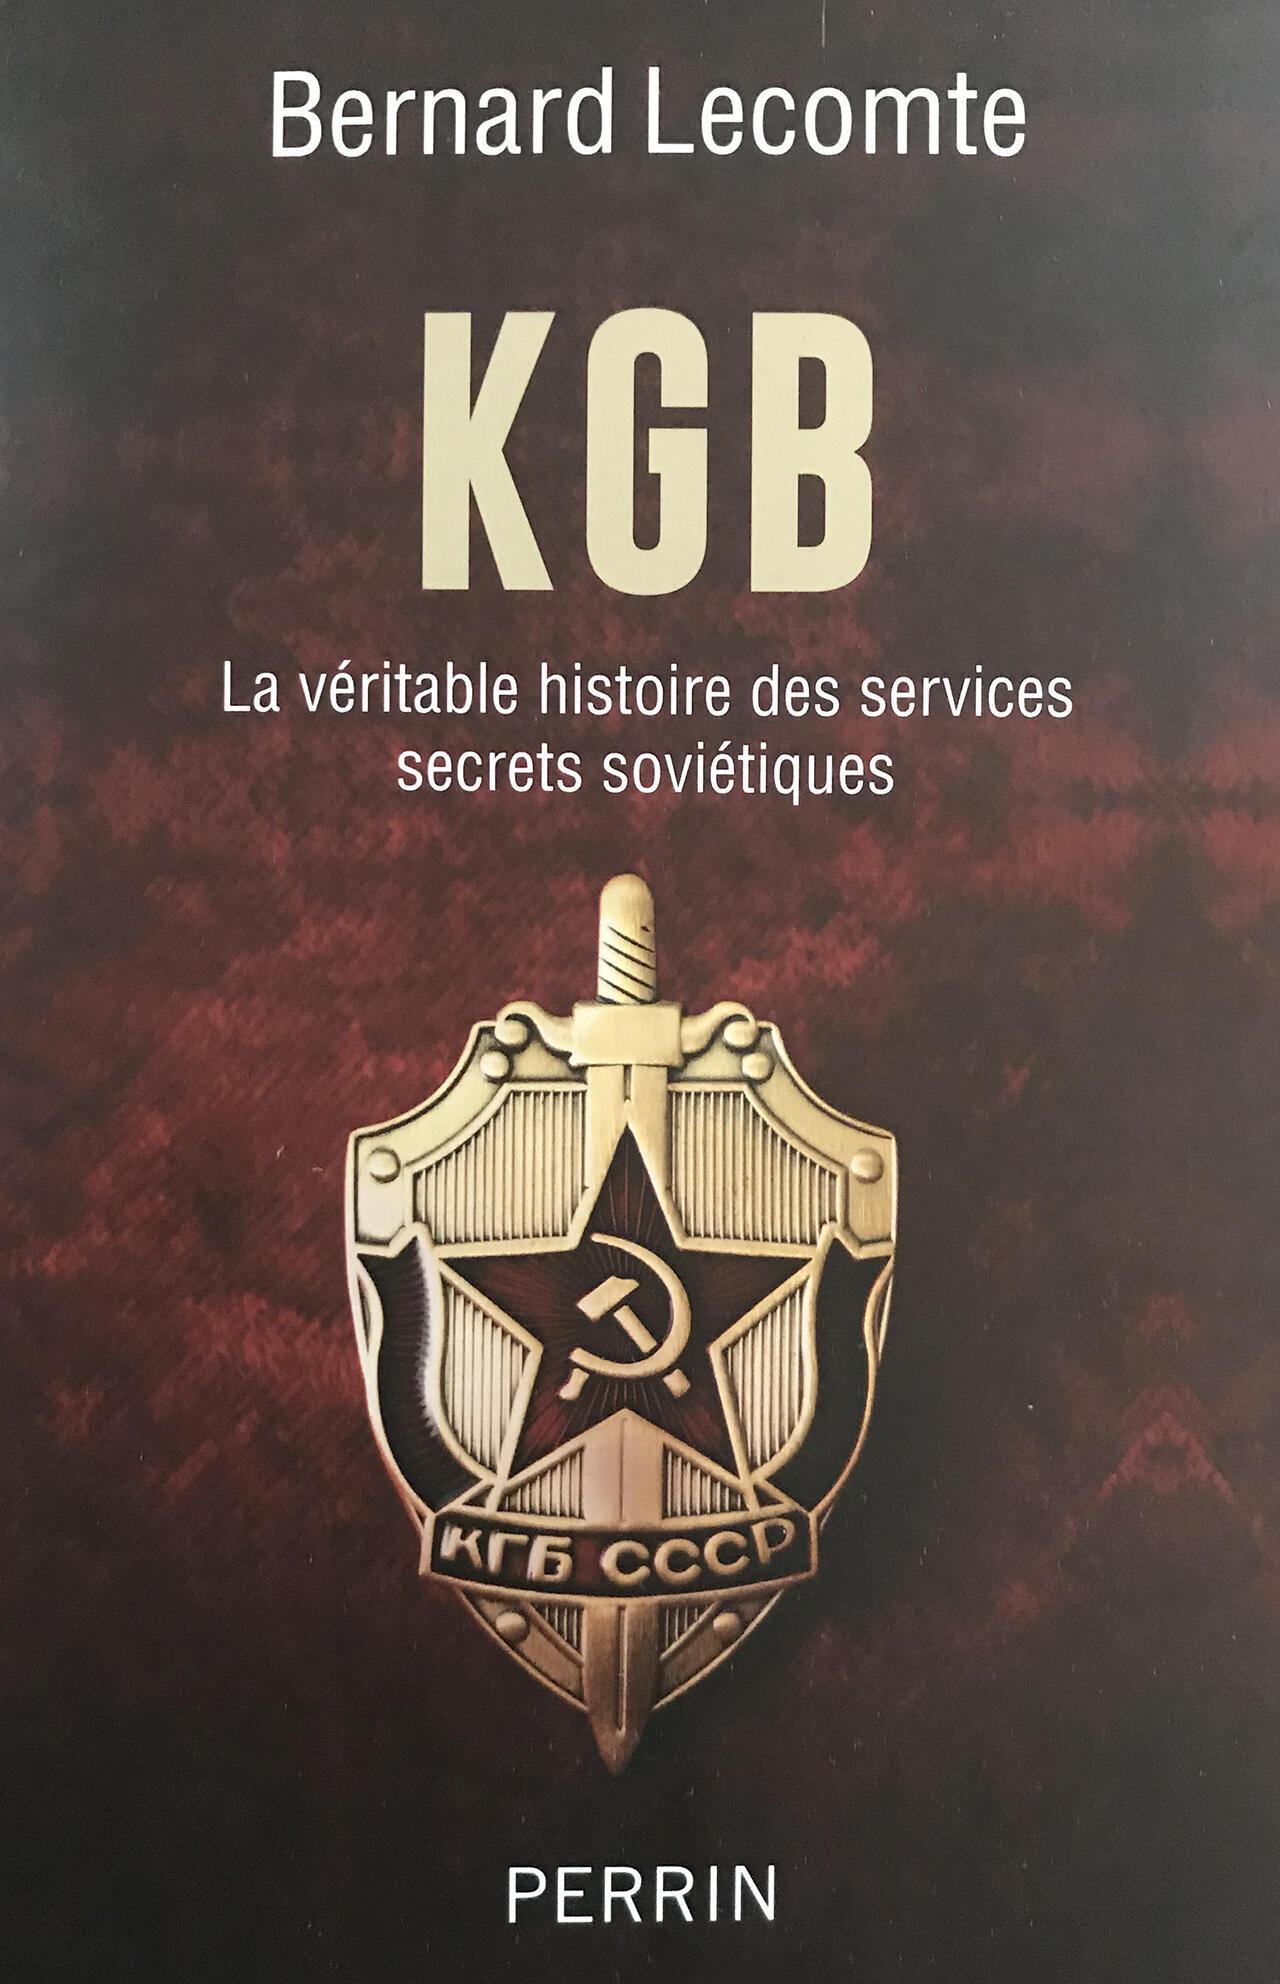 Бернар Леконт. Невыдуманная история КГБ. Изд. Perrin. 2020.